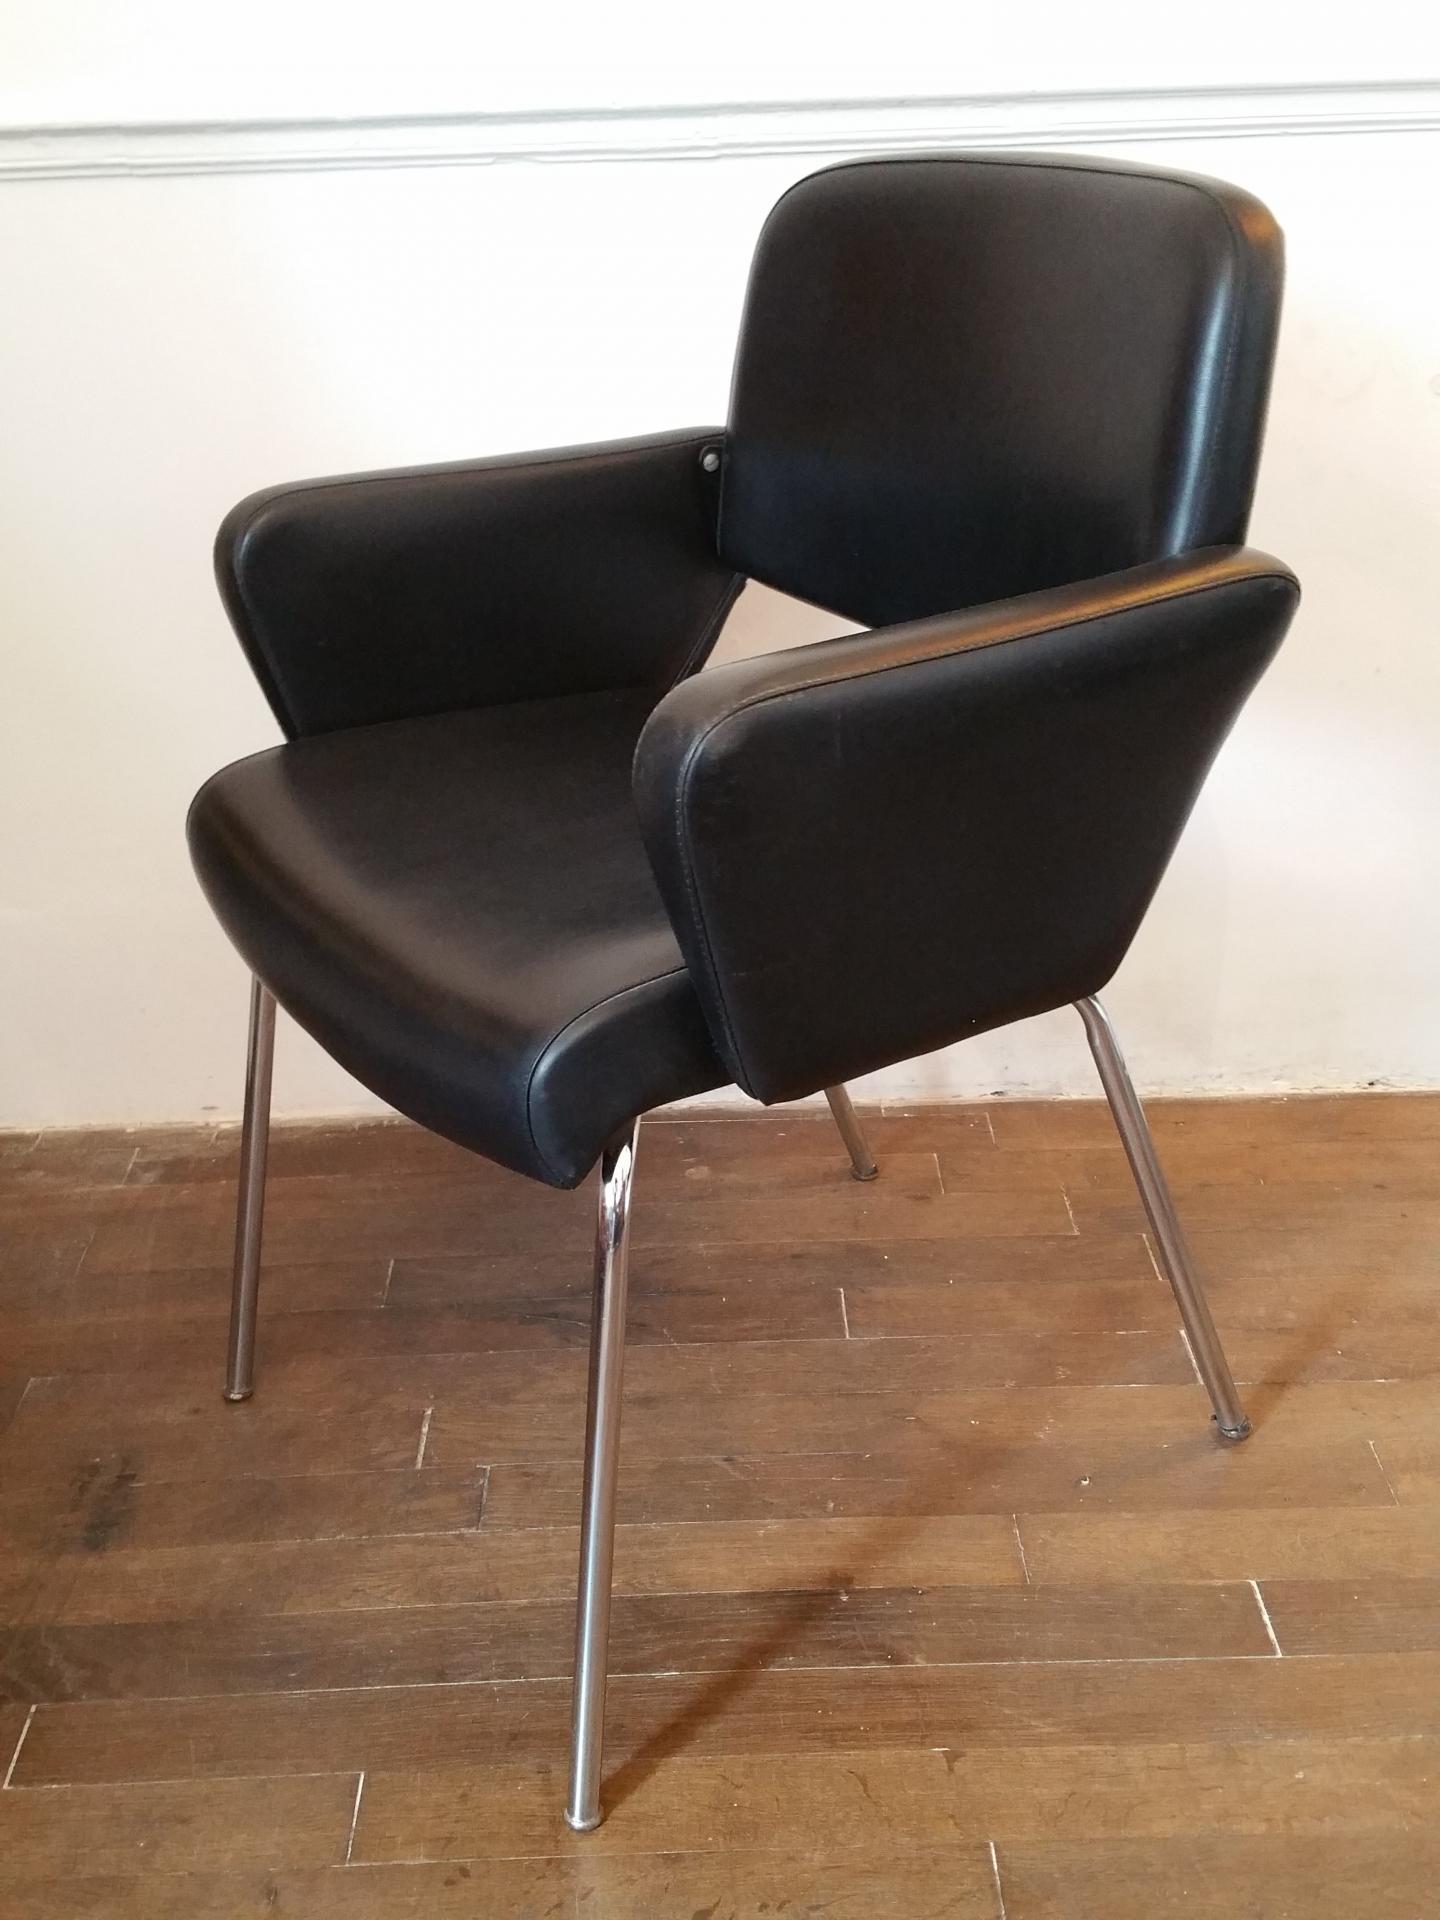 fauteuil vintage en ska noir fauteuil design 70. Black Bedroom Furniture Sets. Home Design Ideas